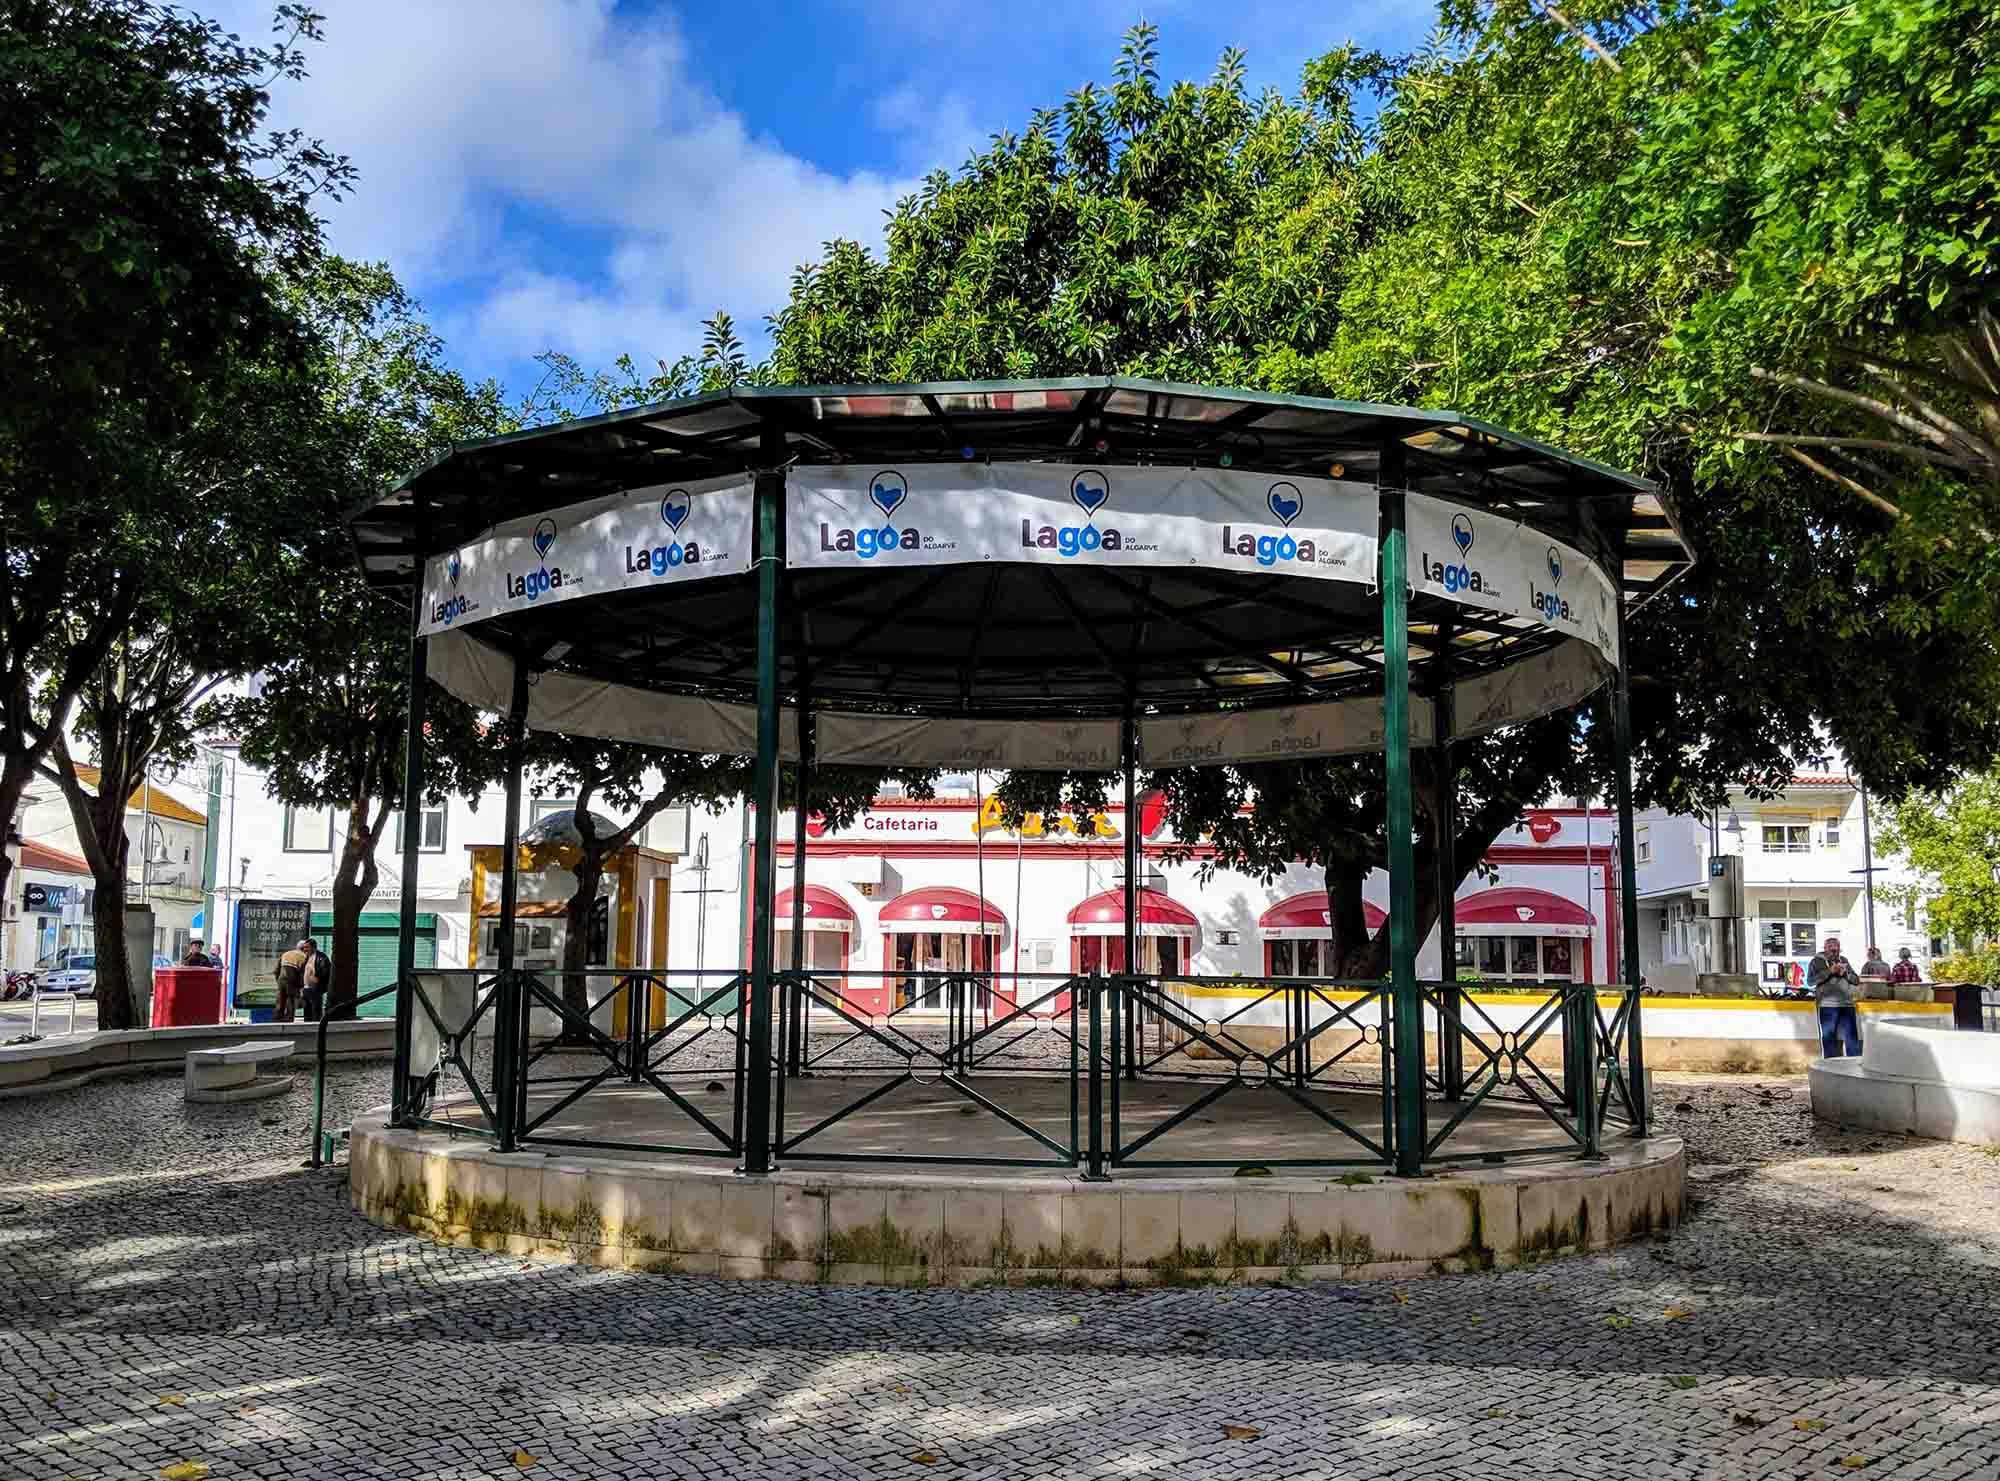 Lagoa bandstand